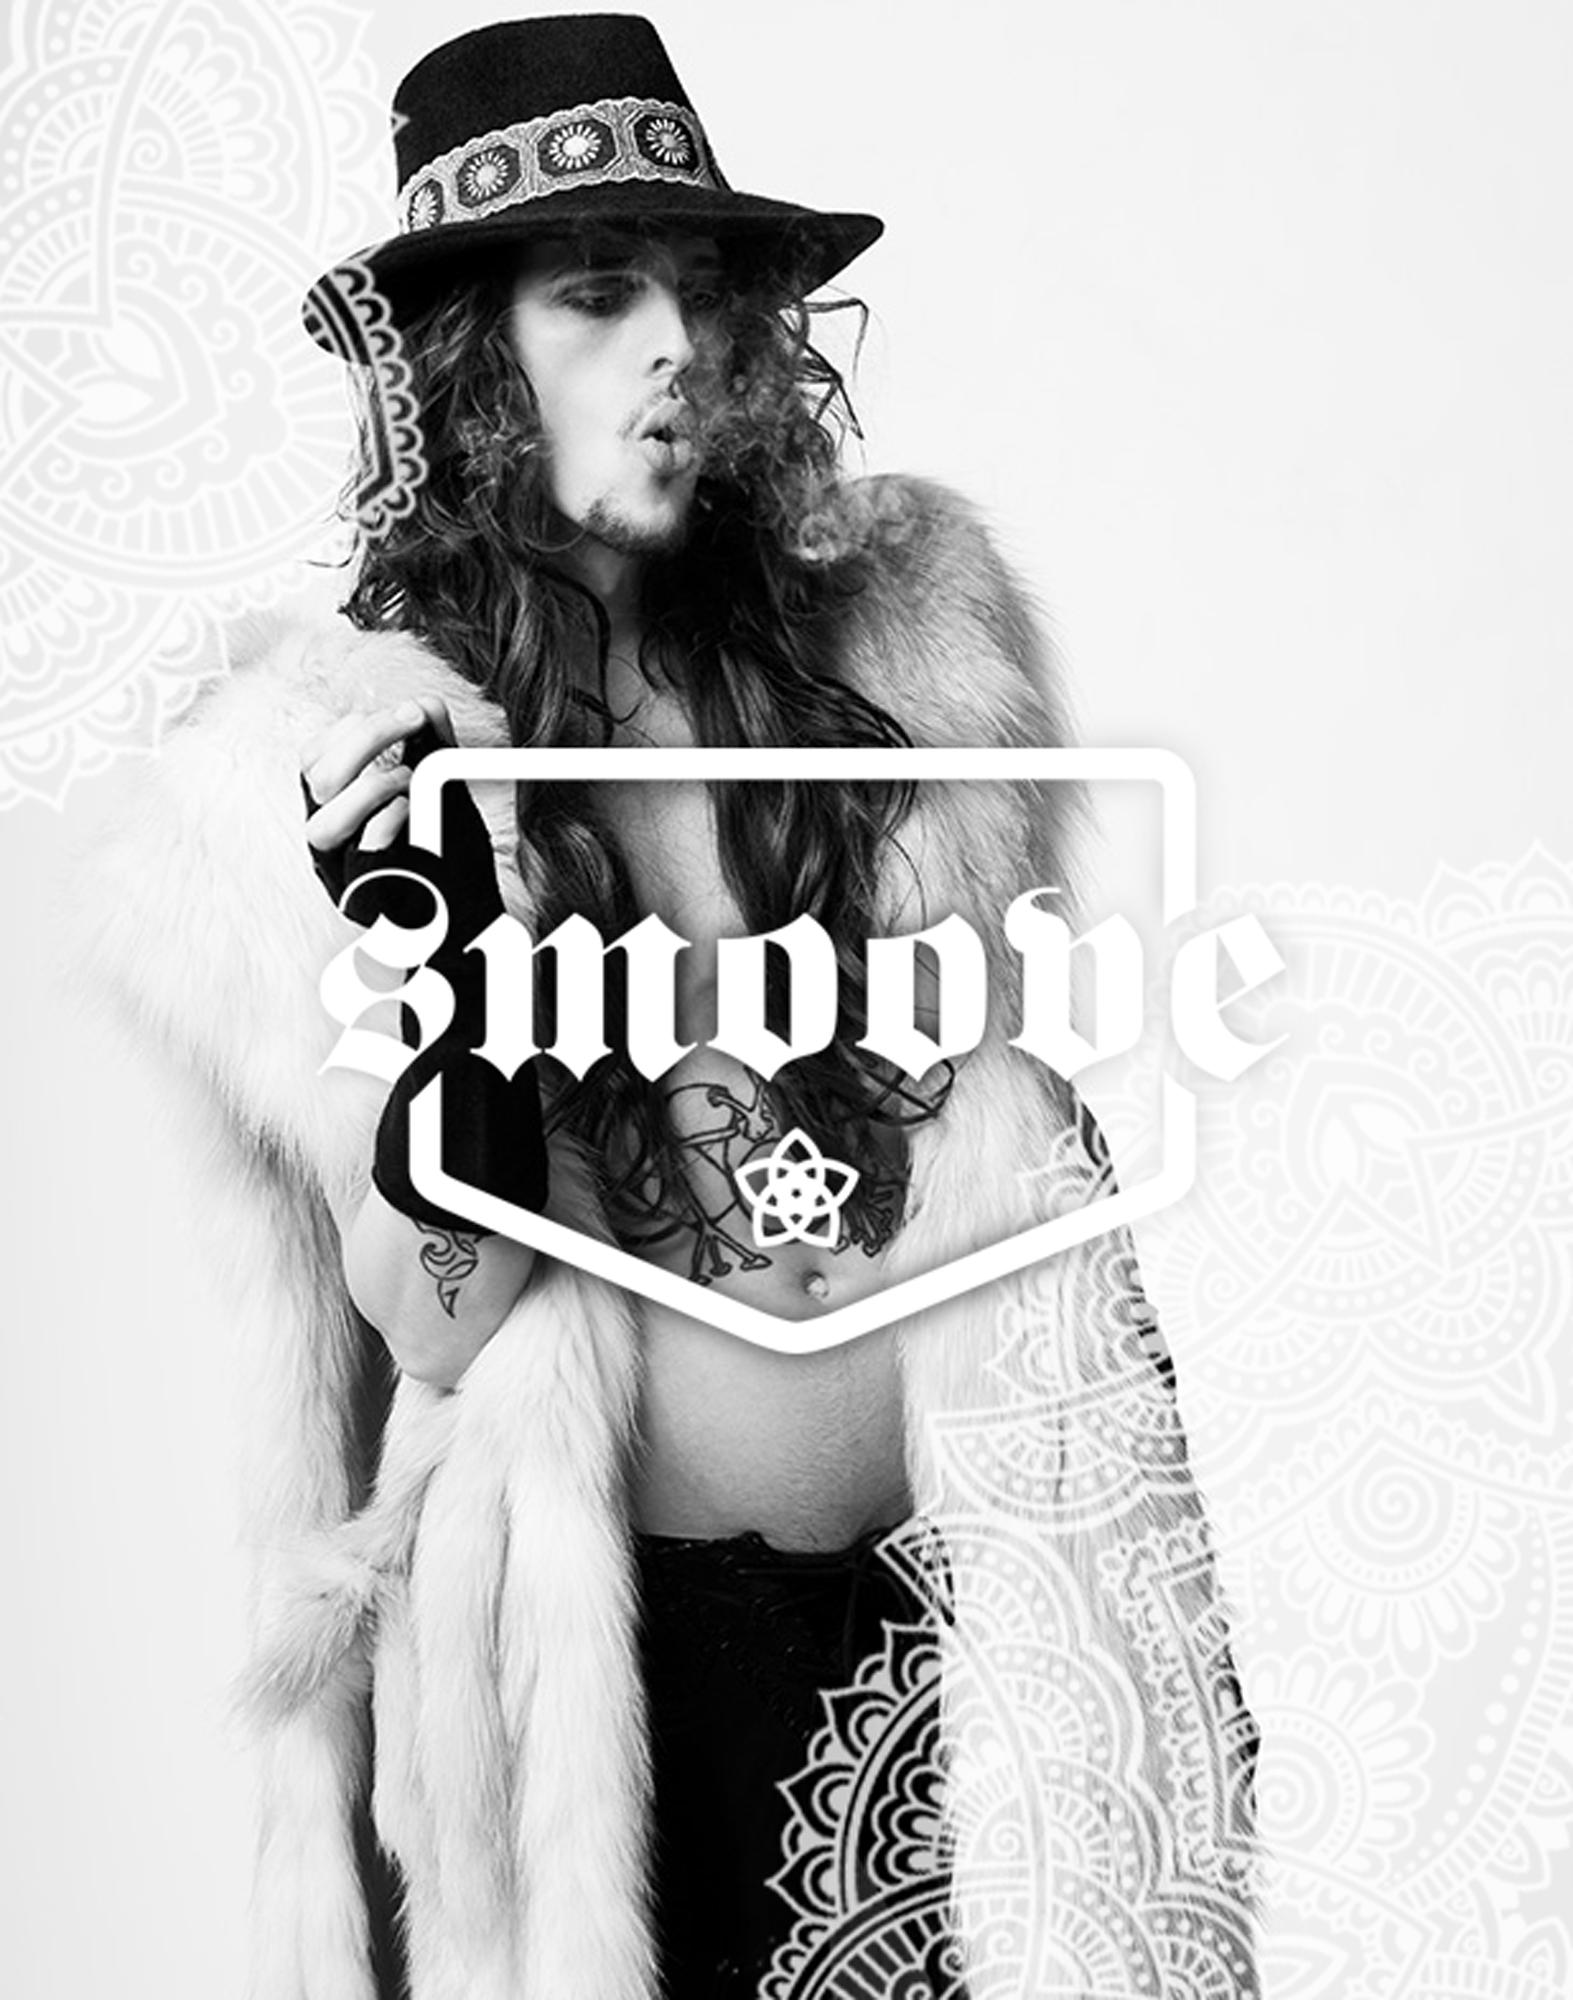 Smoove-Image.png